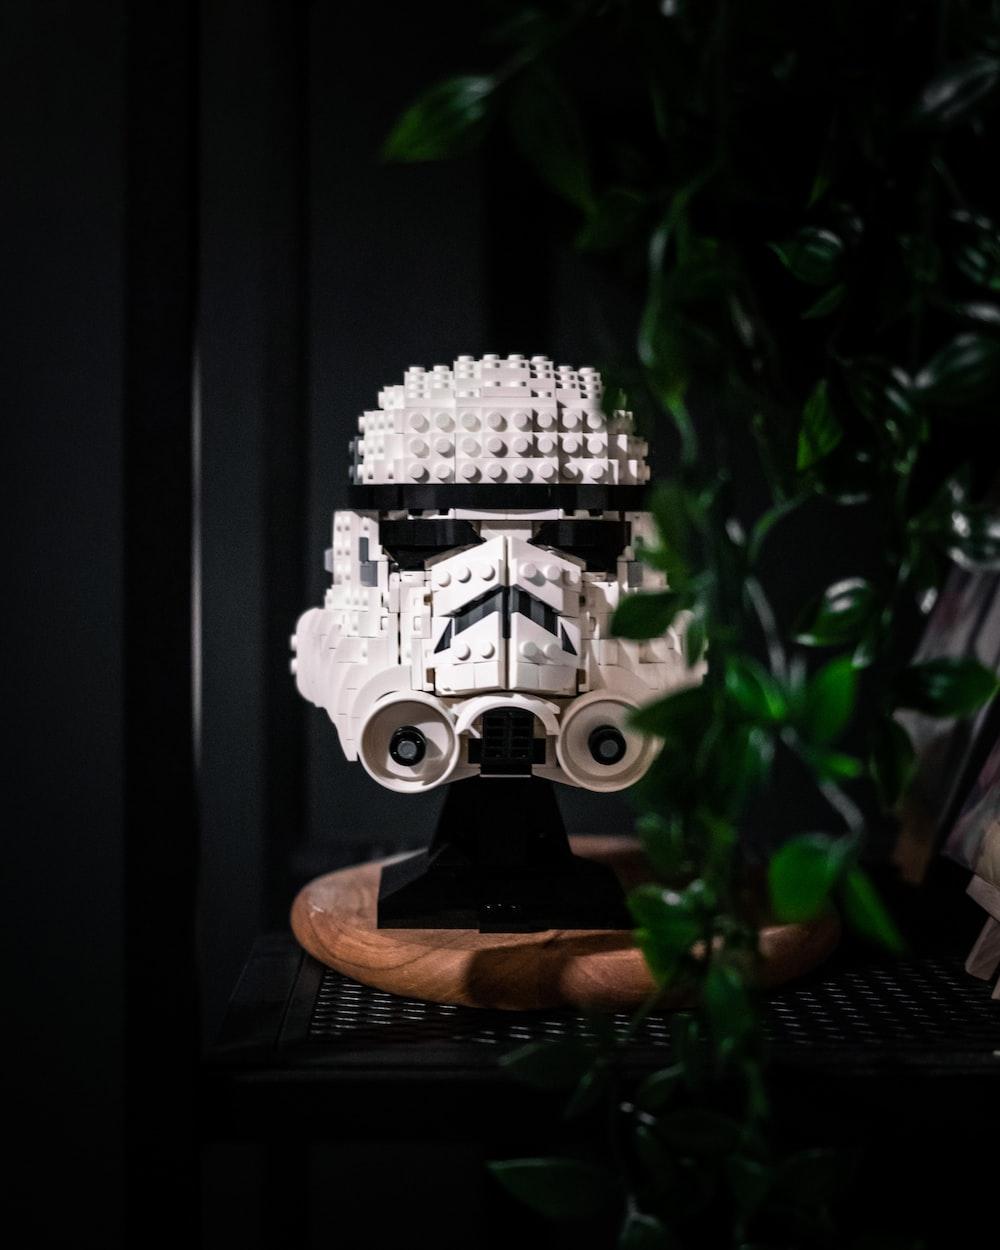 white and black robot figurine